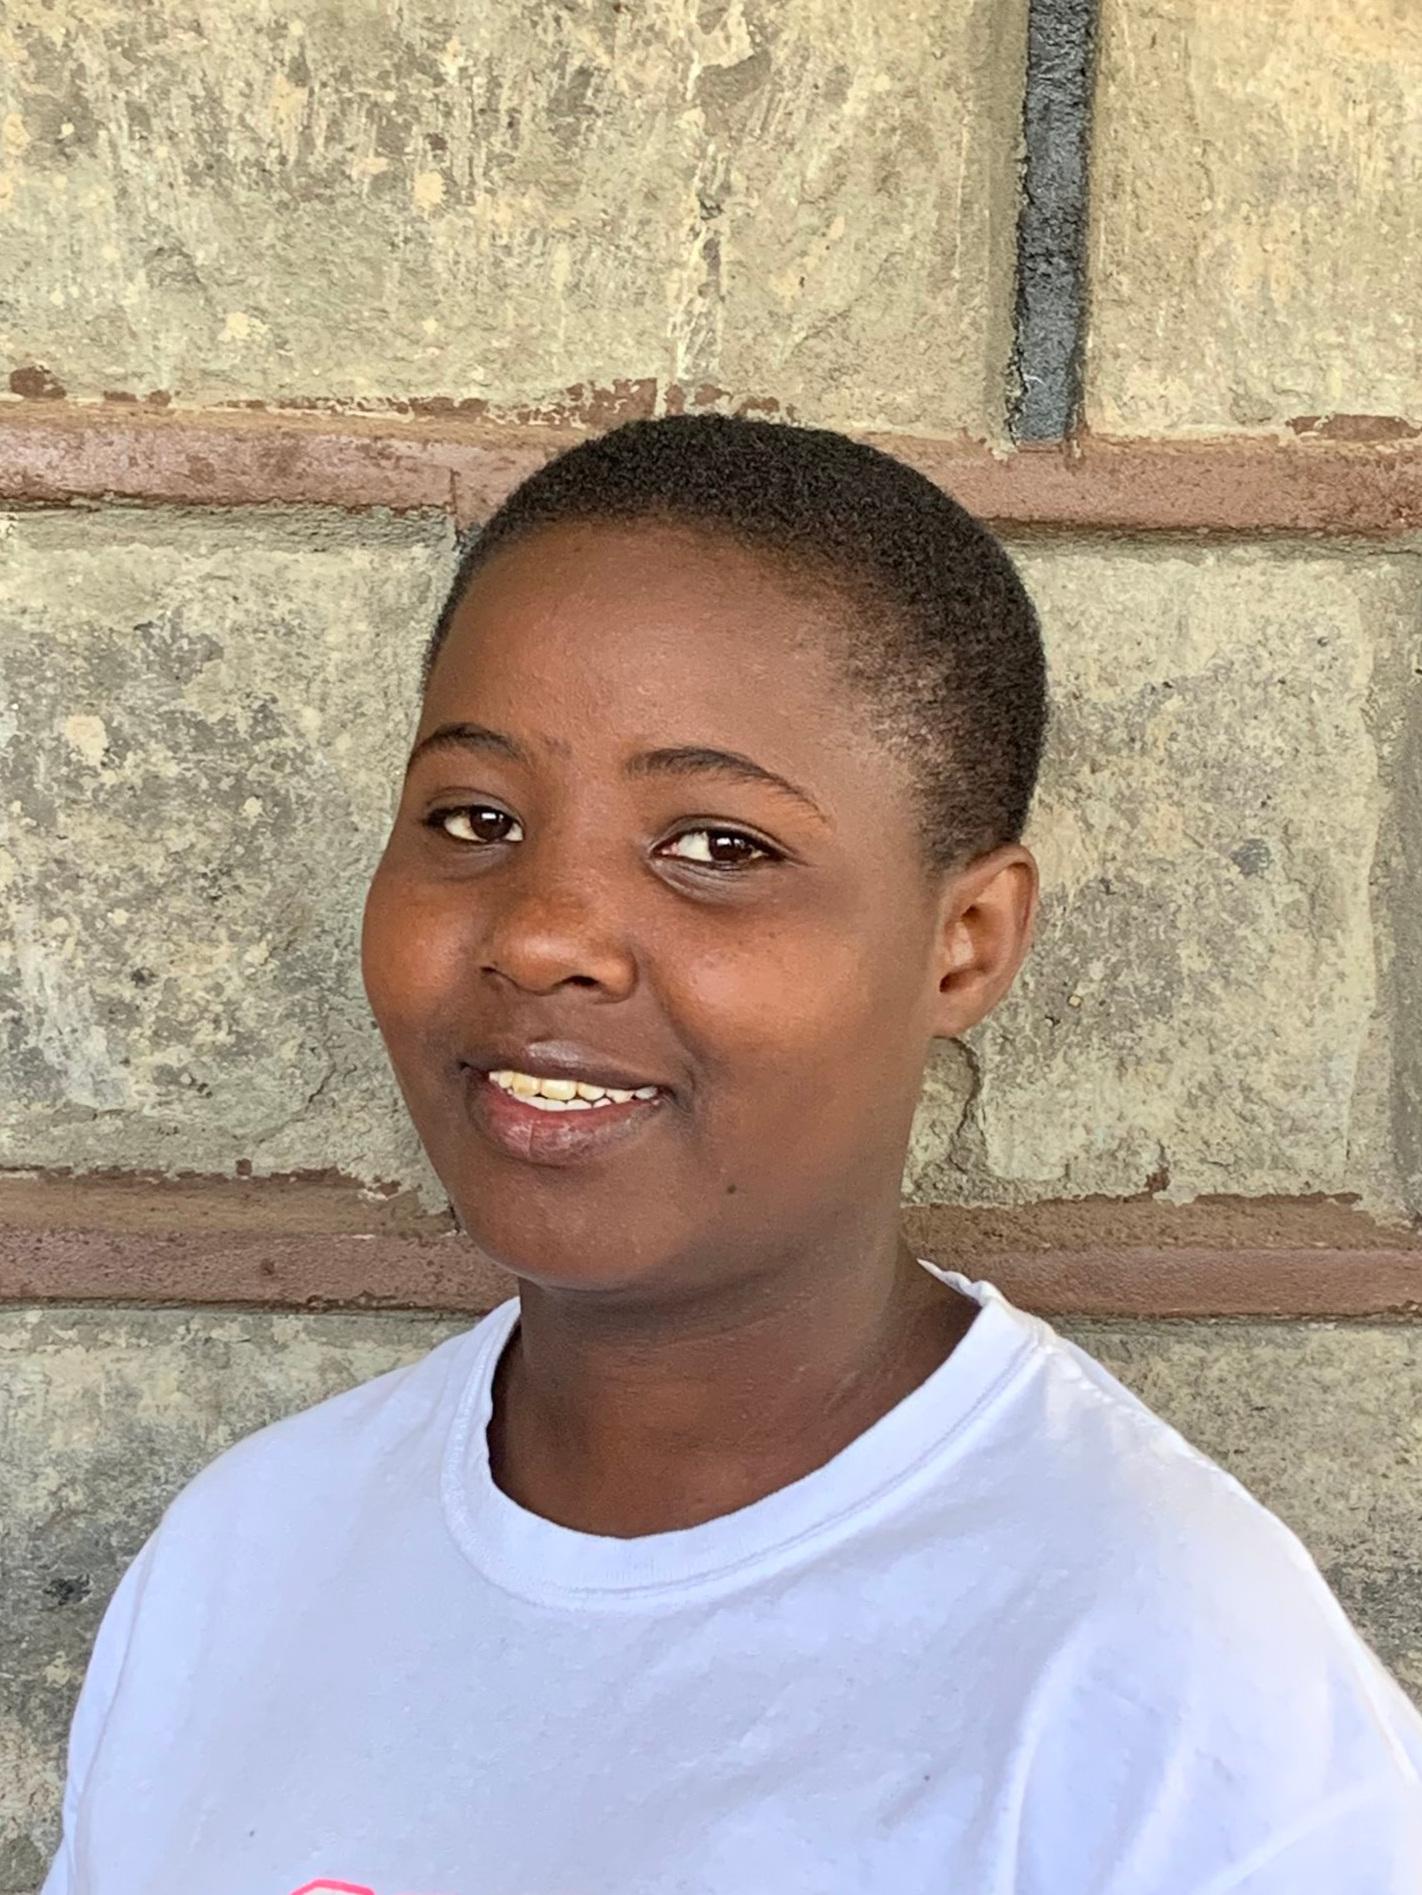 Gladys Ngoshosh - $45 Sponsorship